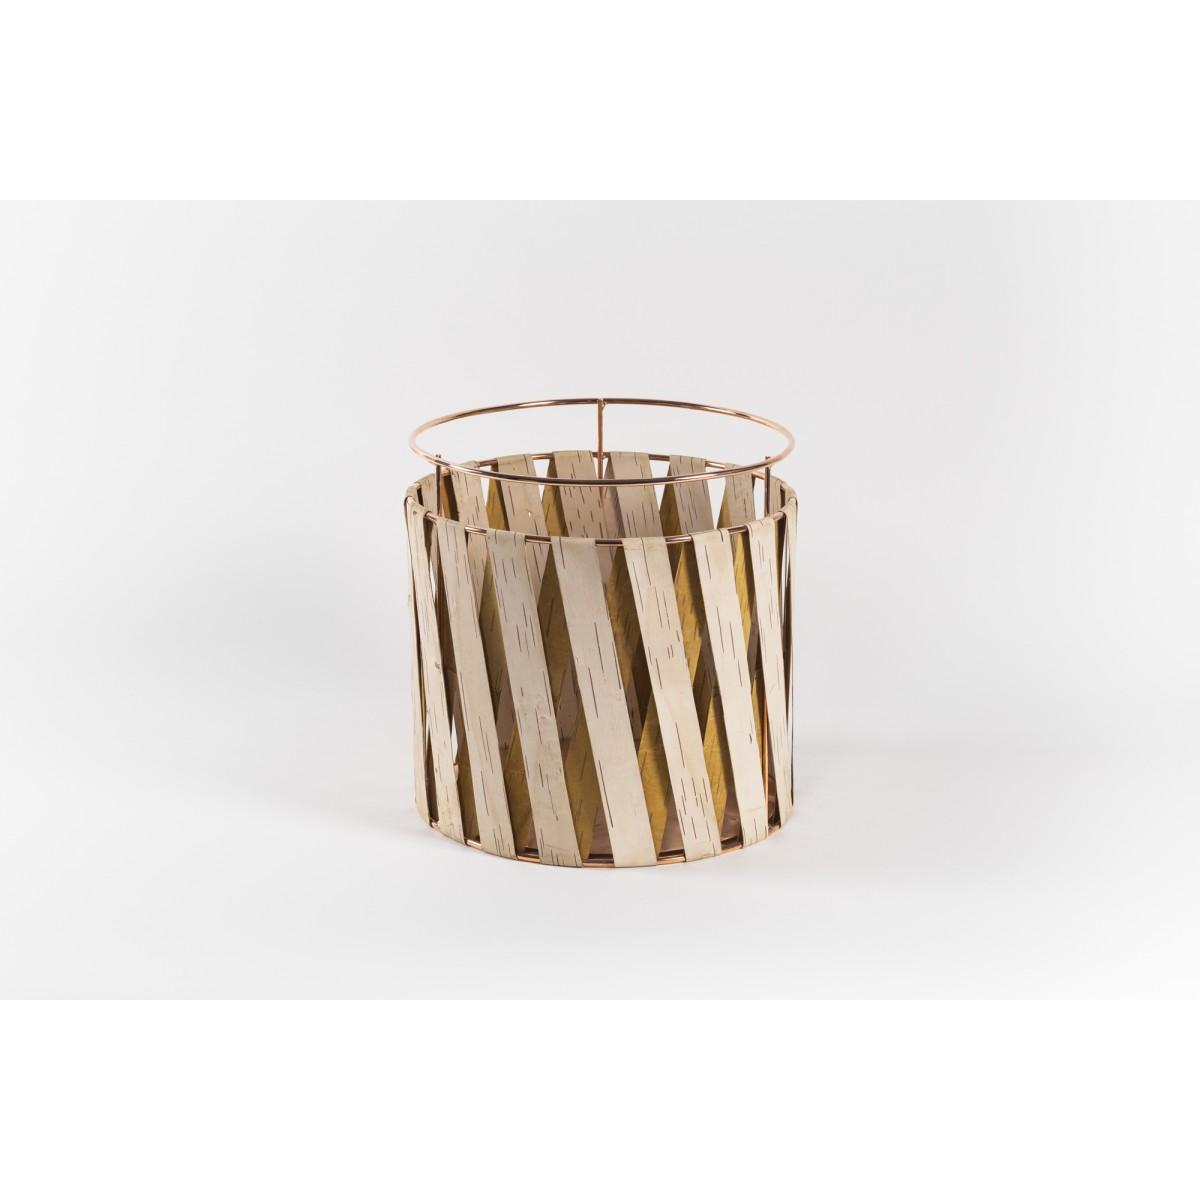 MOYA Körbe aus Birkenrinde Korob BA35 | Copper | Size L